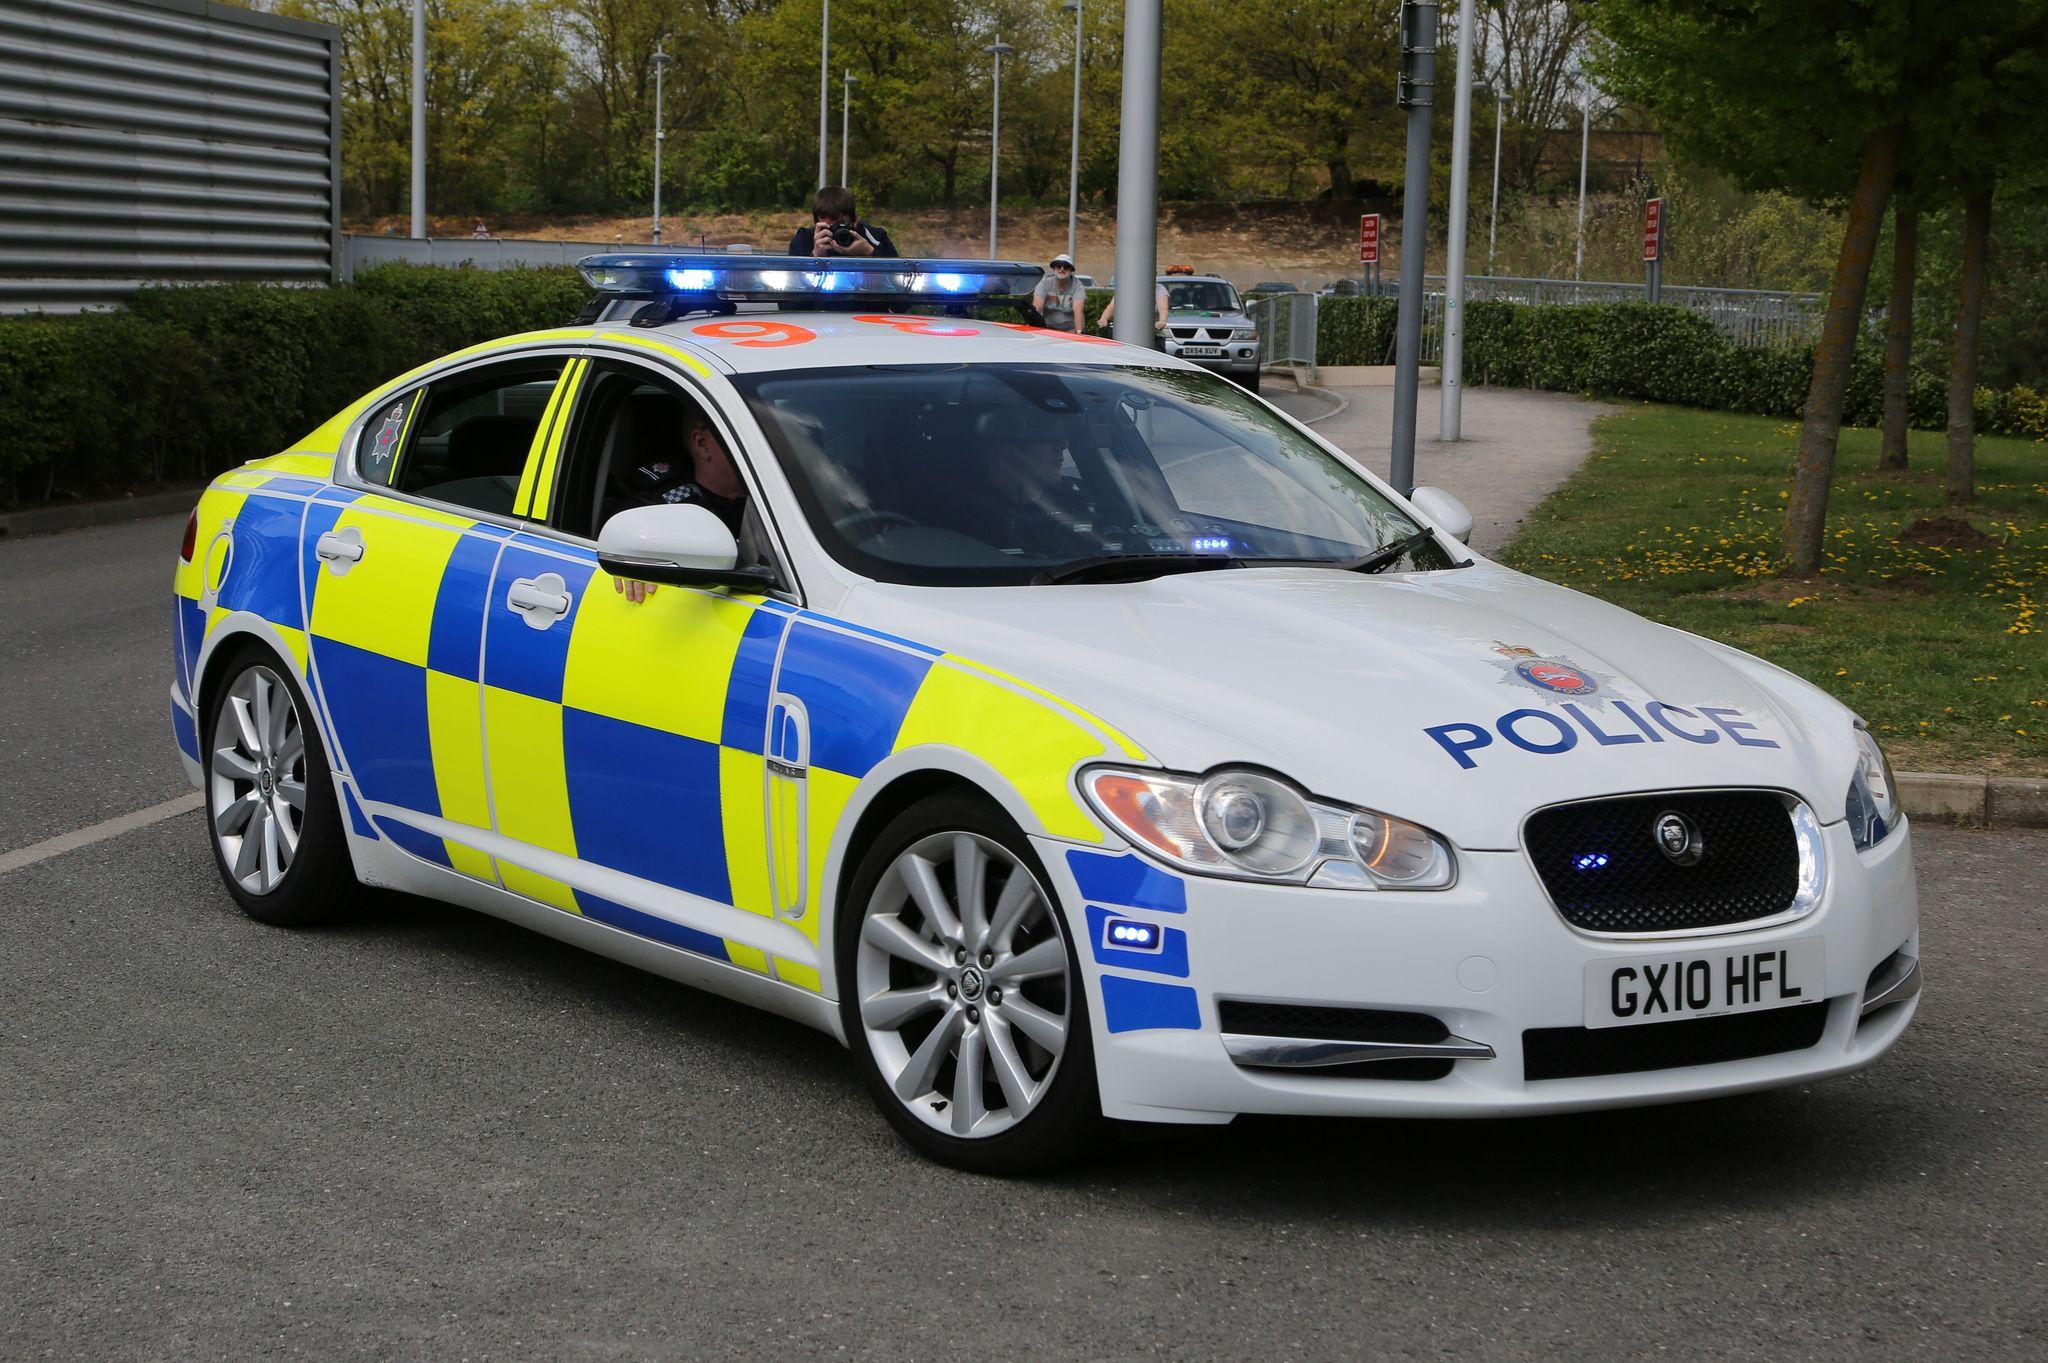 Gx10 Hfl Surrey Police Roads Policing Unit Jaguar Xf